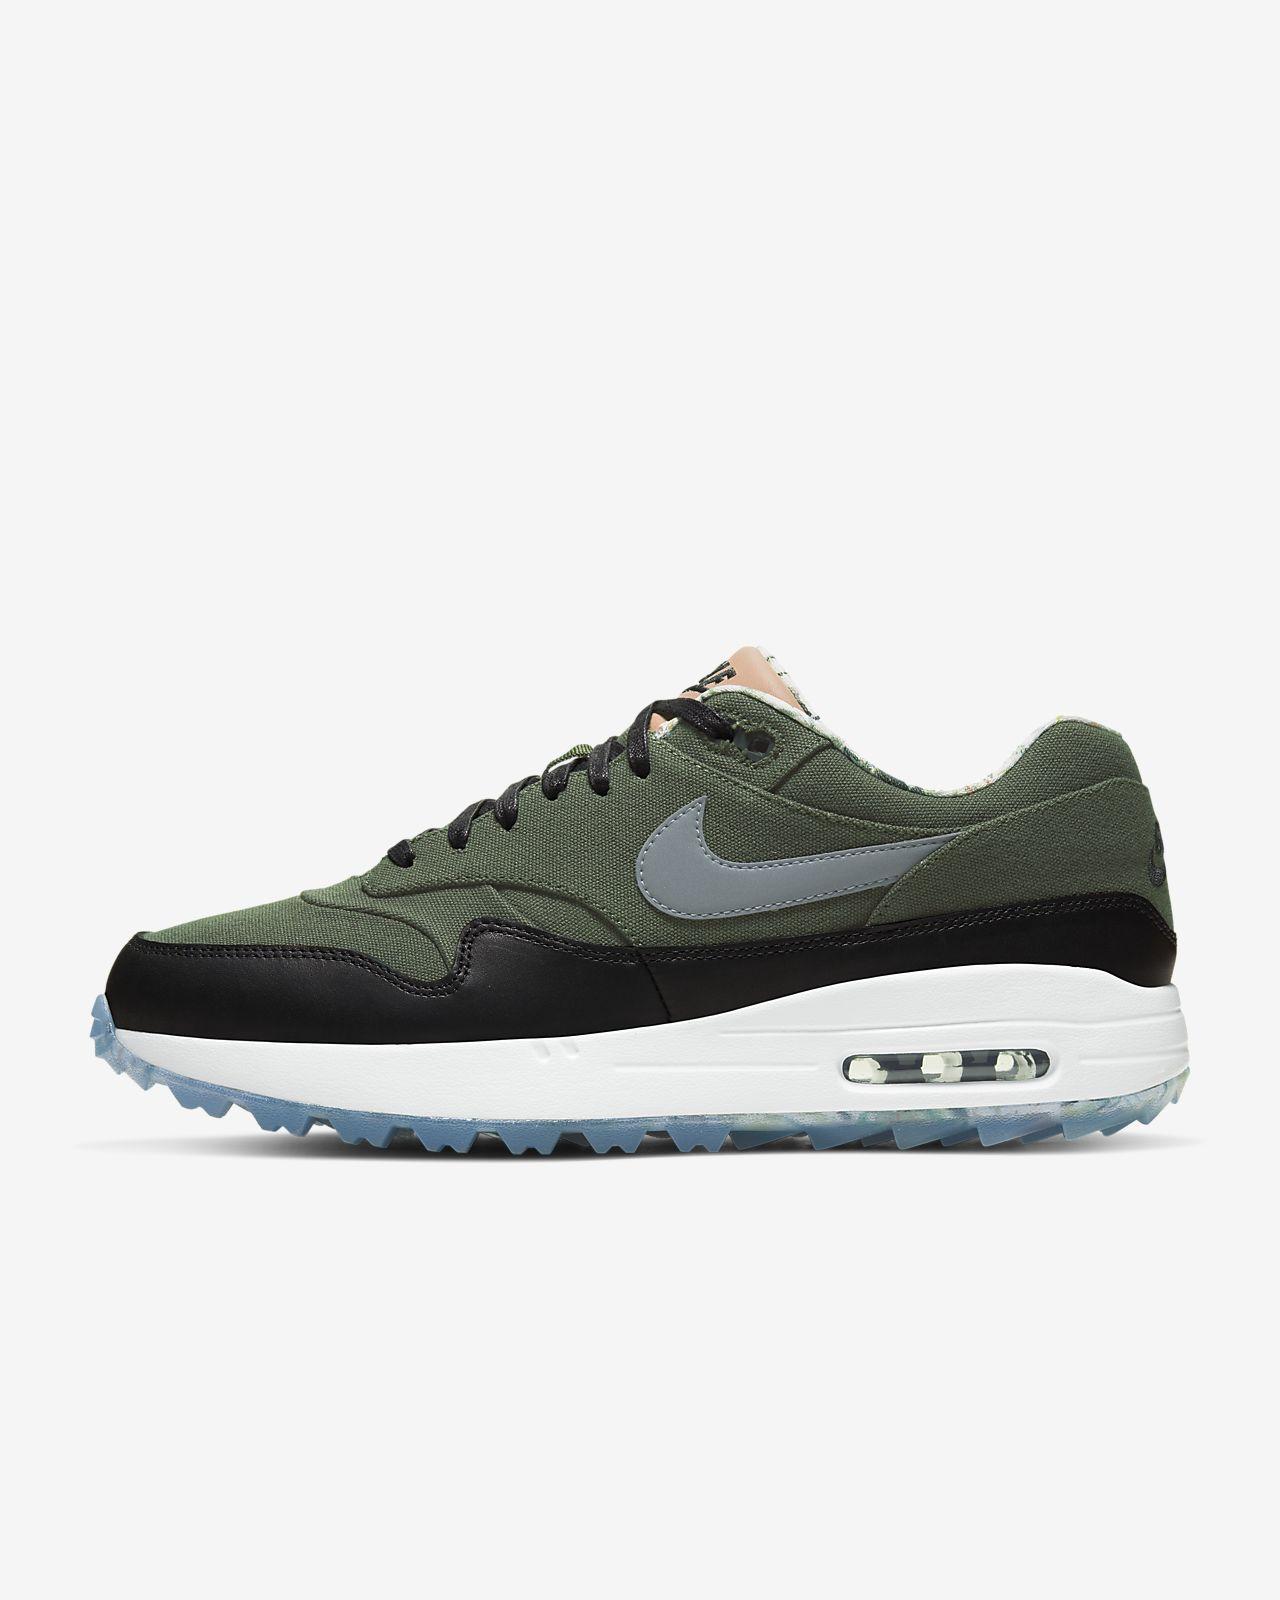 Nike Air Max 1 G NRG Herren-Golfschuh